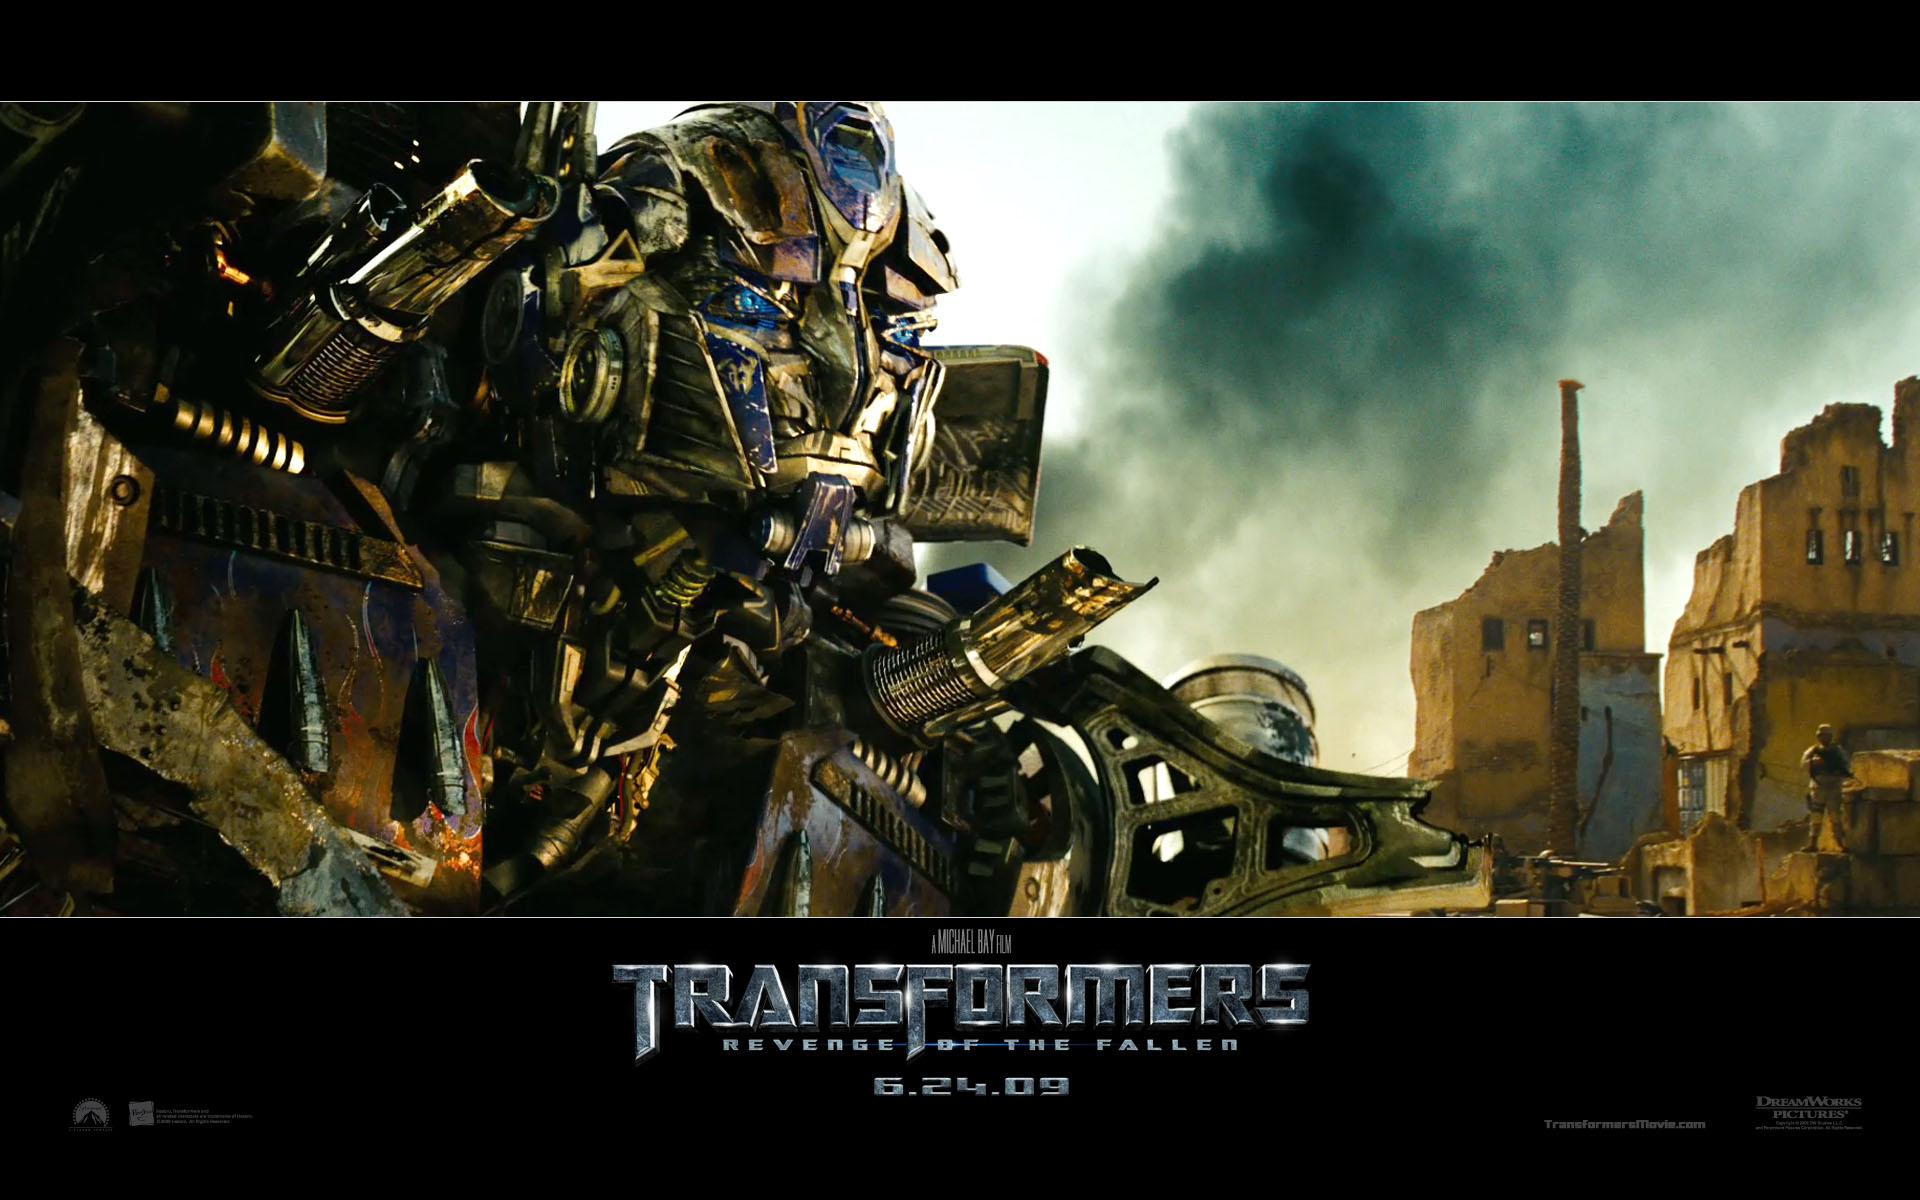 Optimus Prime In Transformers Revenge Of The Fallen Desktop Wallpaper